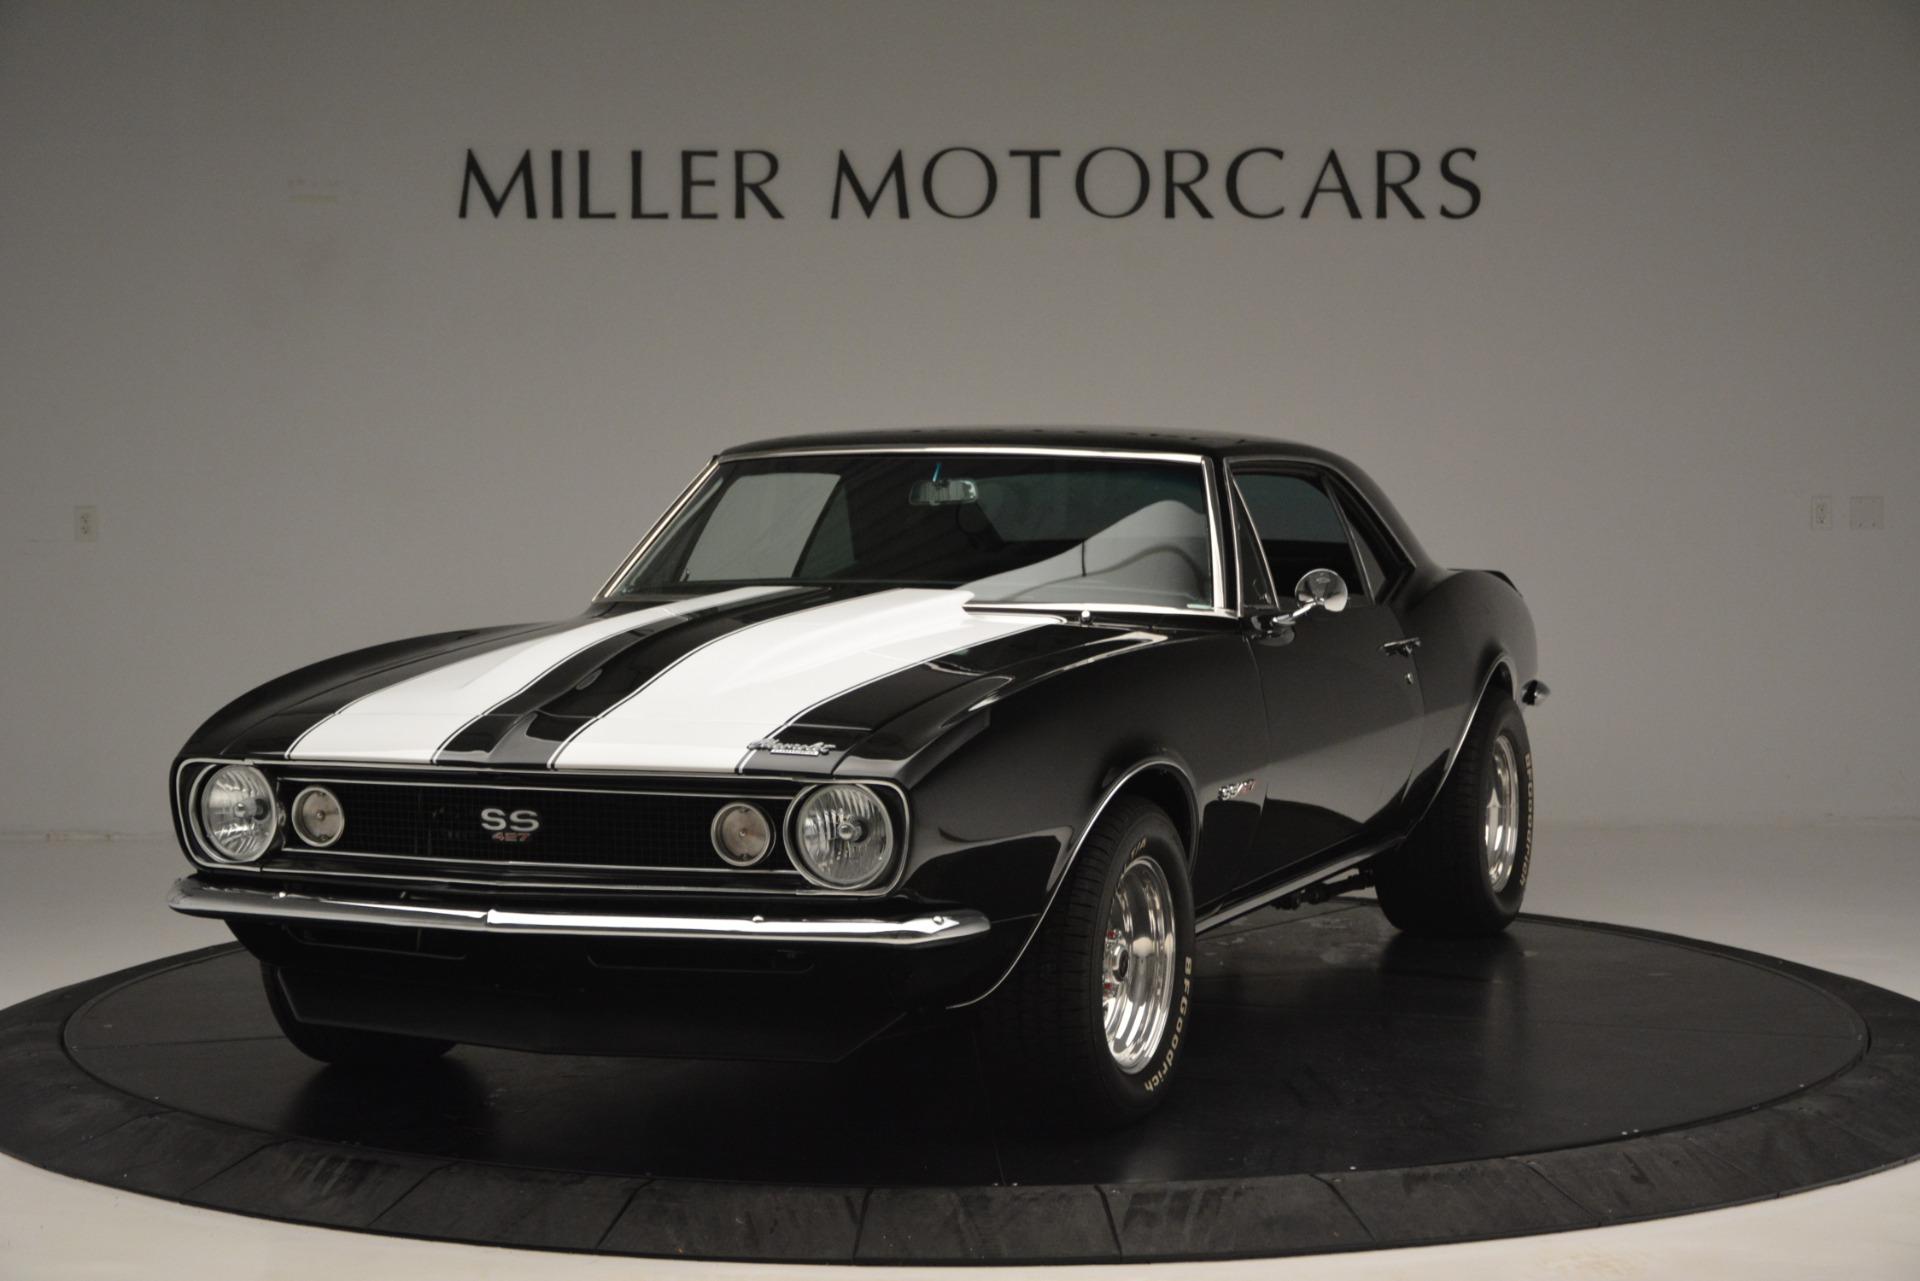 Kelebihan Kekurangan Chevrolet Camaro Ss 1967 Murah Berkualitas